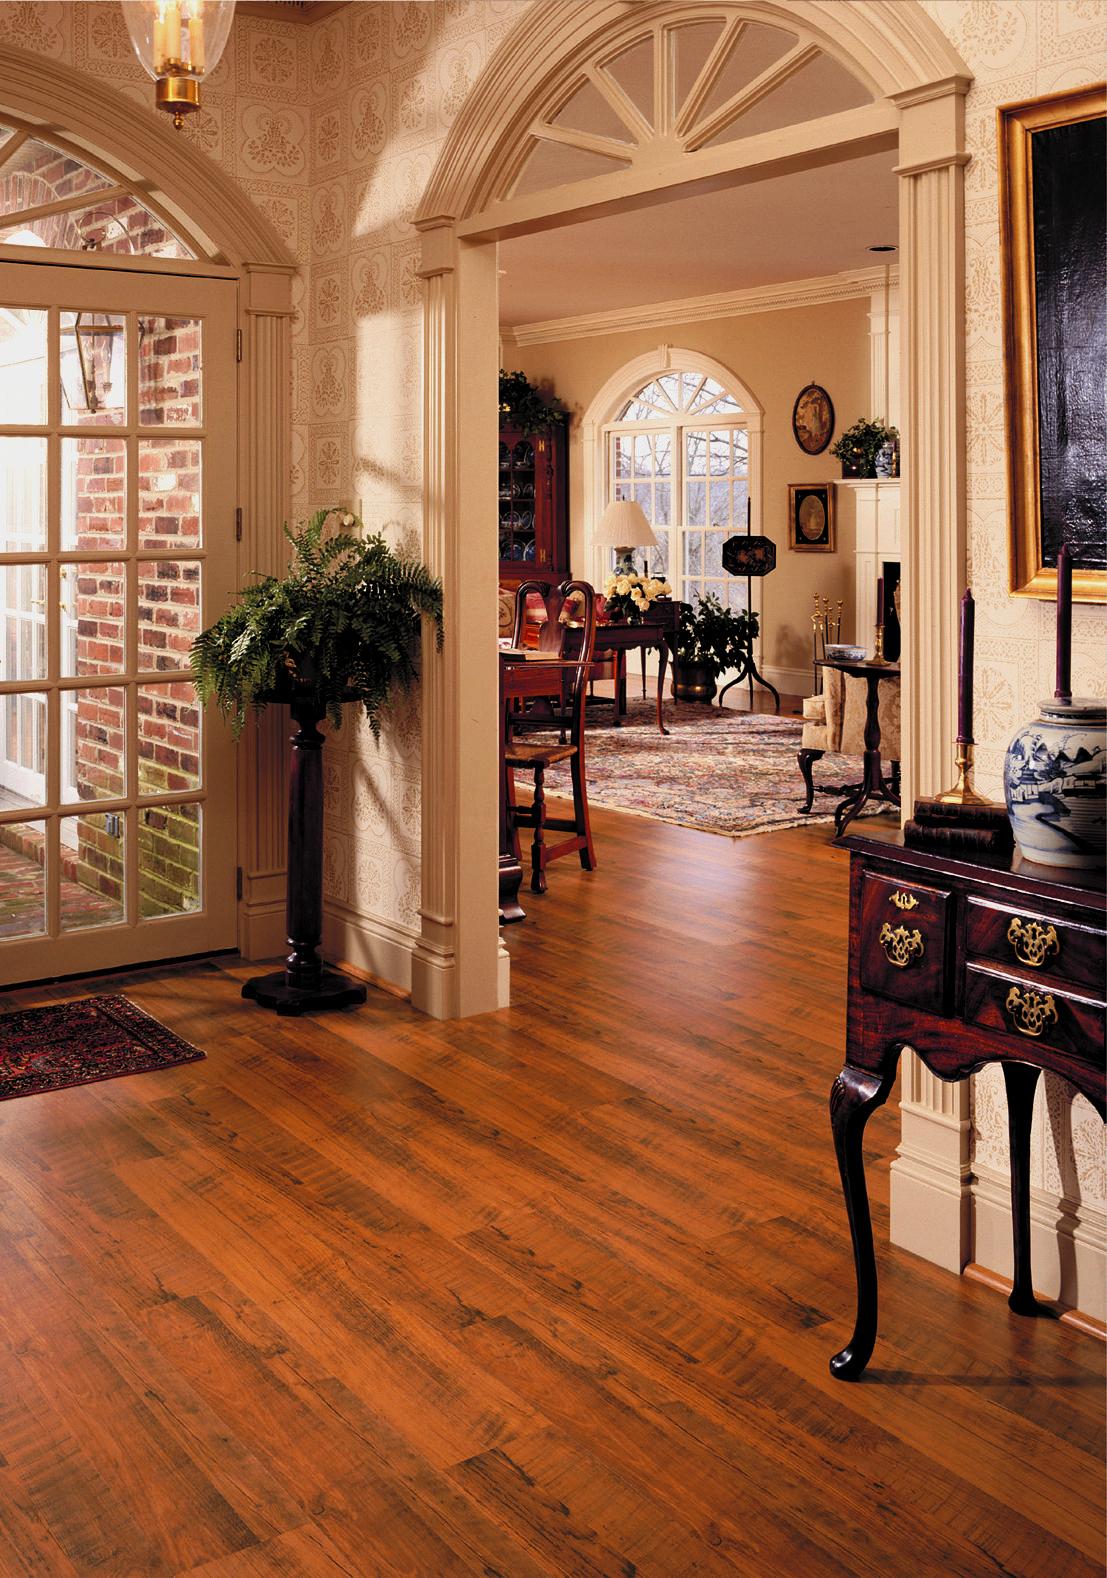 High Gloss Formal Look Laminate 12mm Now Only 2 99 Sf Wecker S Flooring Center 717 755 5432 Http York Abbeycarpet Co Laminate Flooring Flooring Colorado